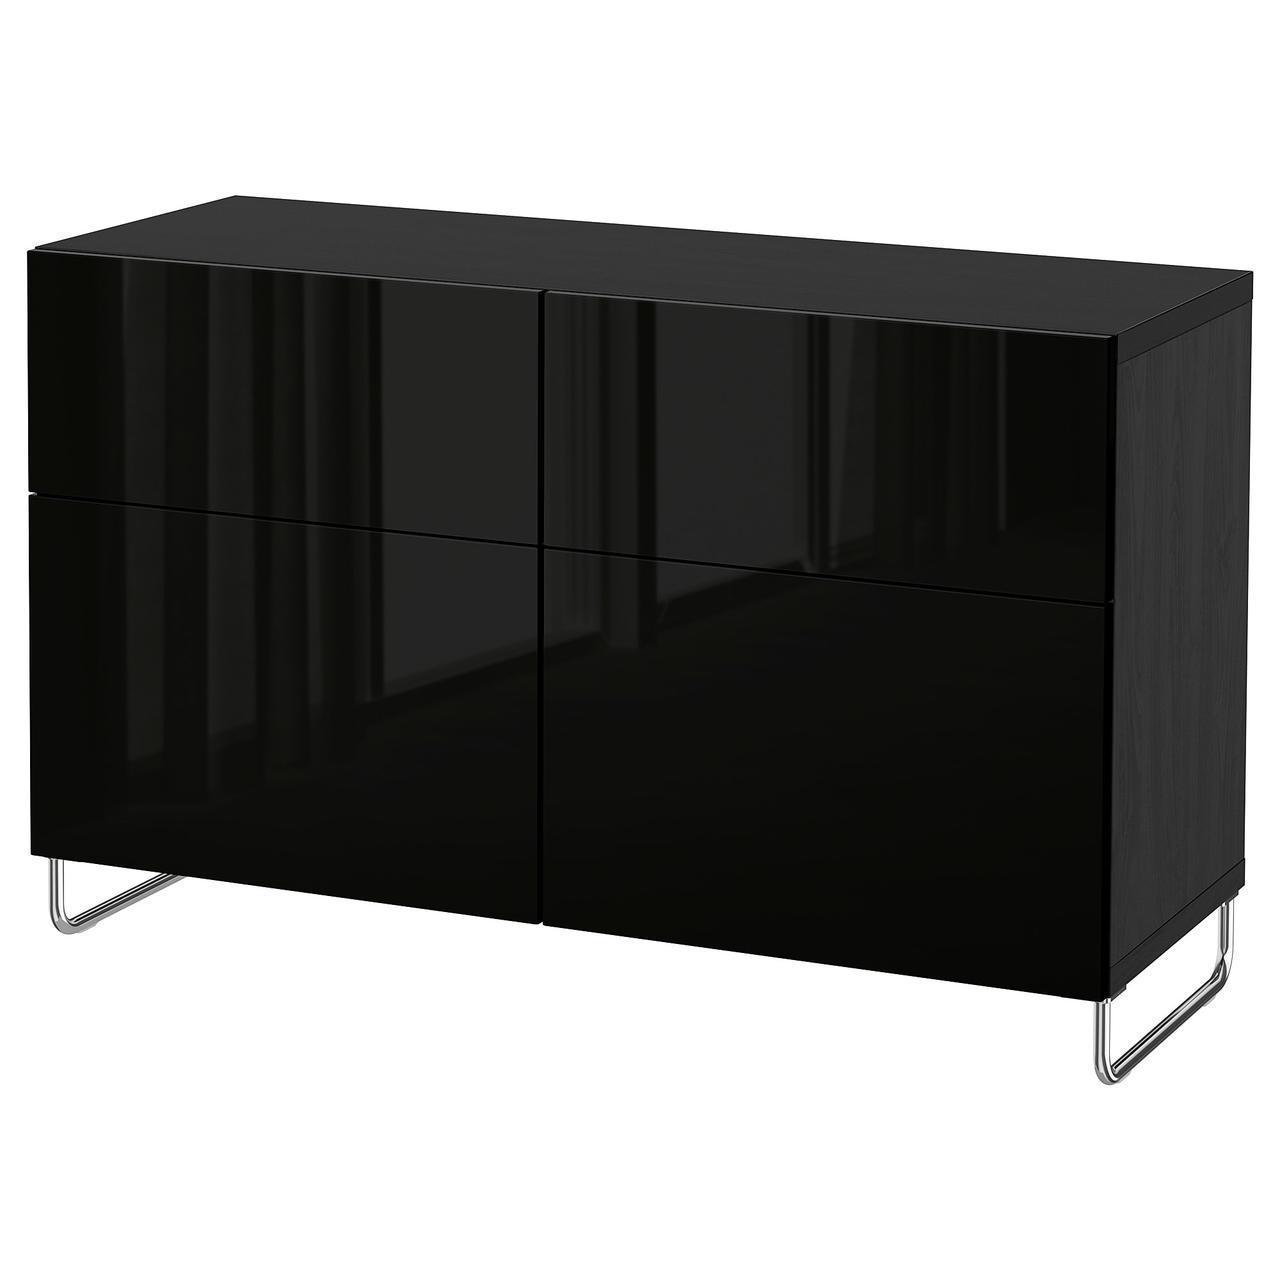 Тумба IKEA BESTÅ 120x40x74 см Selsviken/Sularp черно-коричневая глянцевая черная 692.685.34